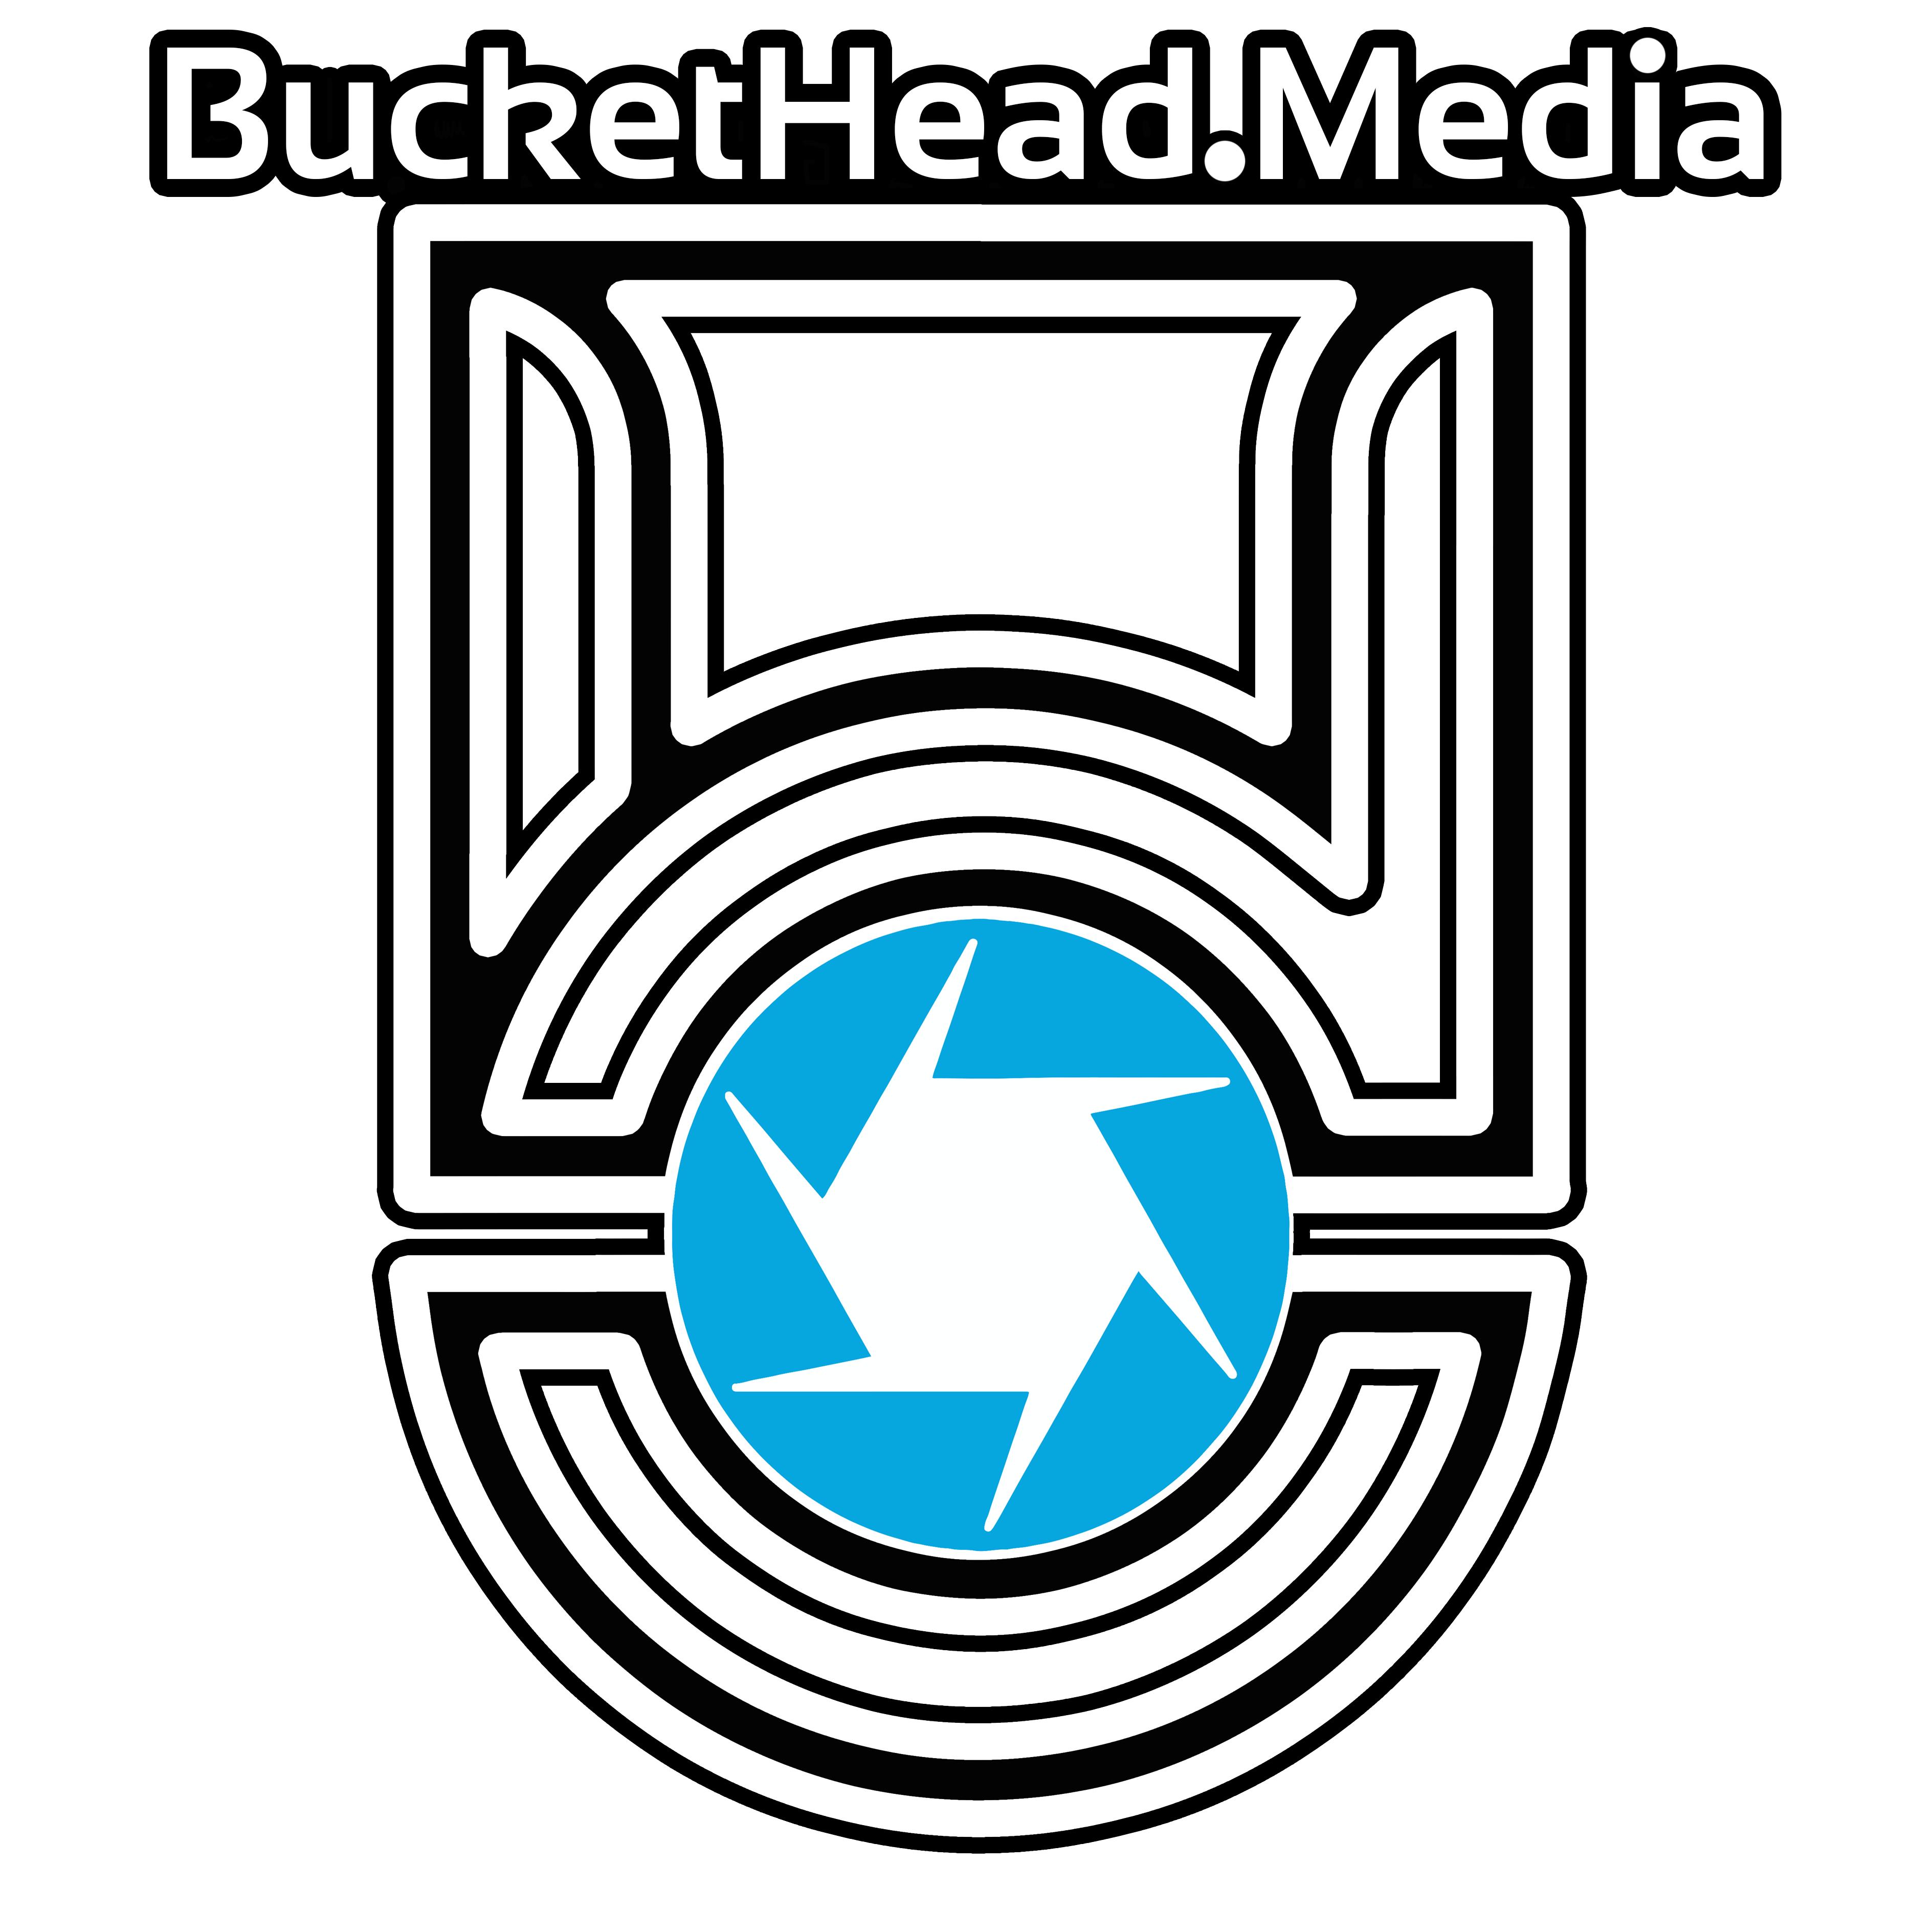 BucketHead.Media image 12